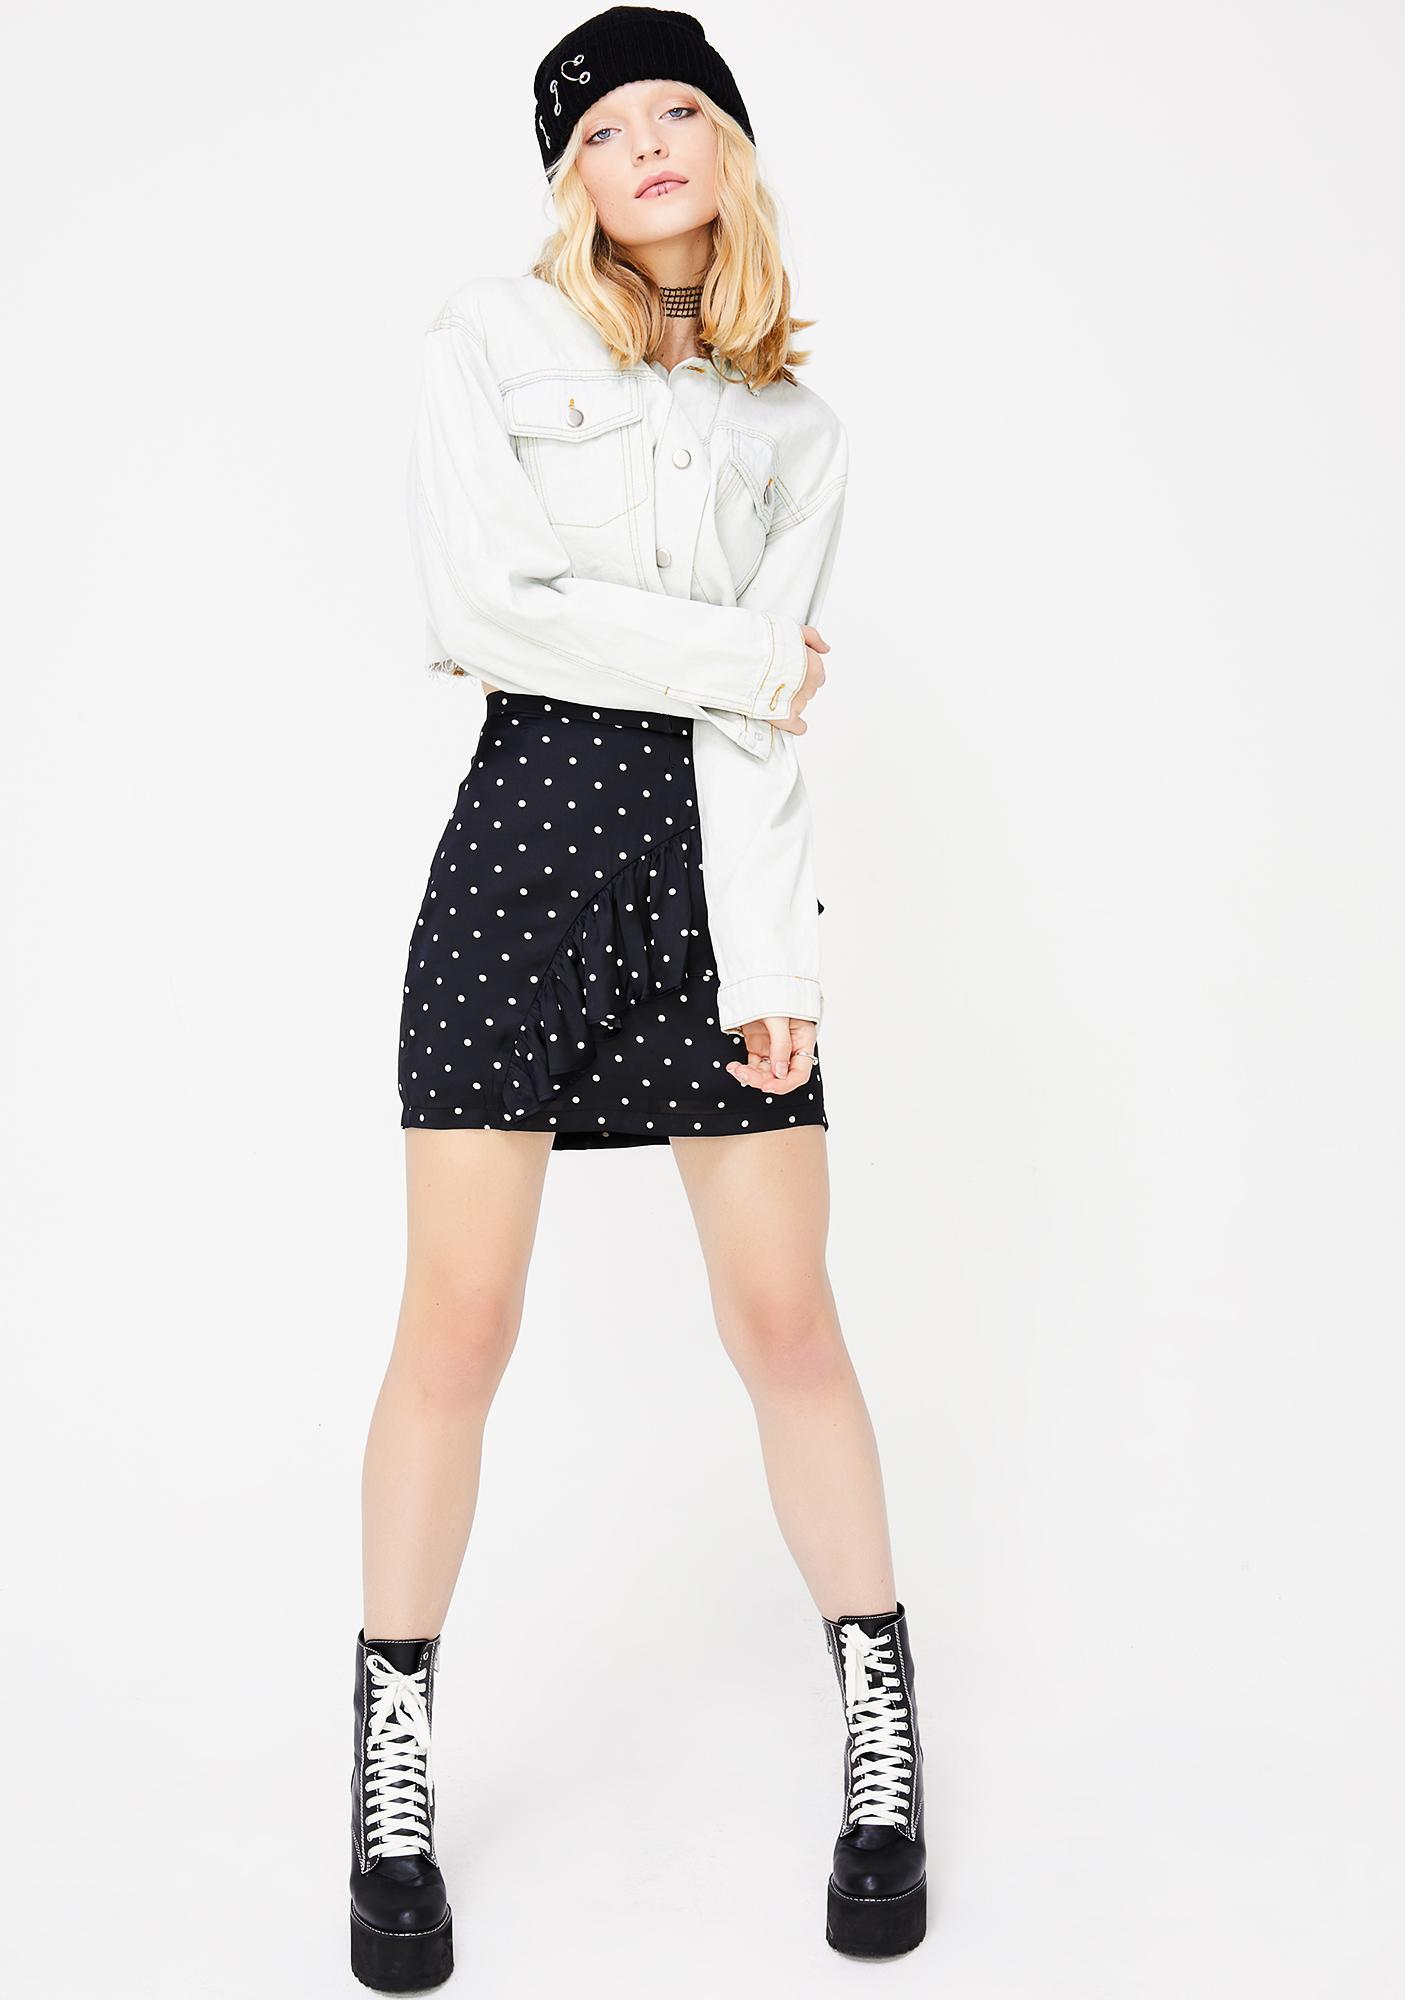 Same Mistakes Skirt